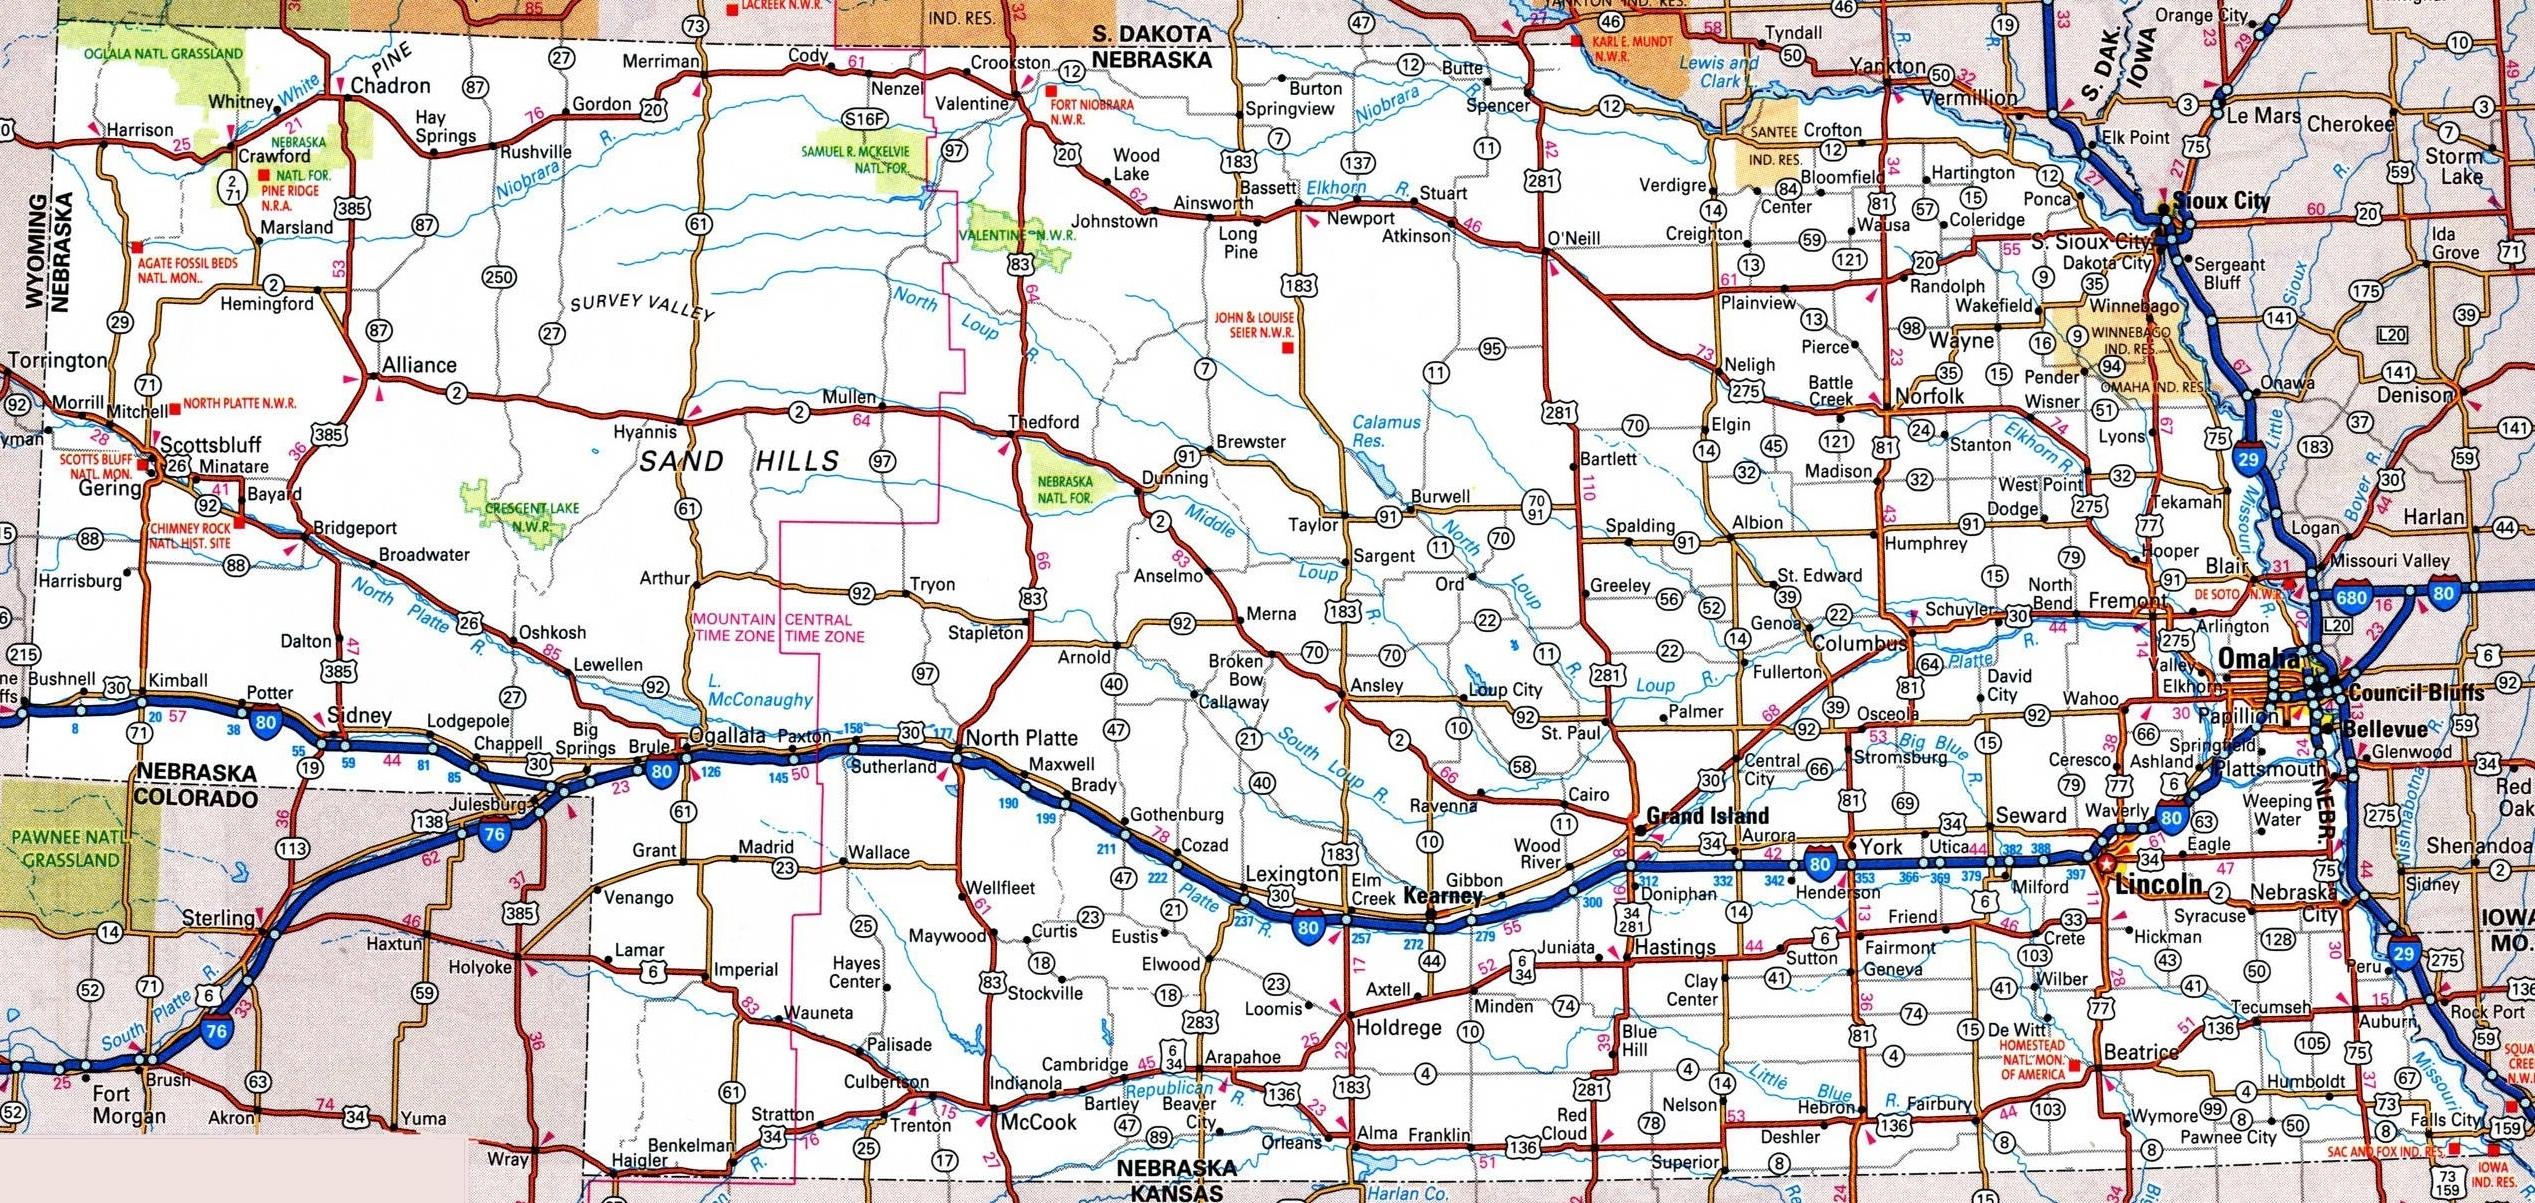 Nebraska Road Map pertaining to Nebraska Highway Map With Mile Markers